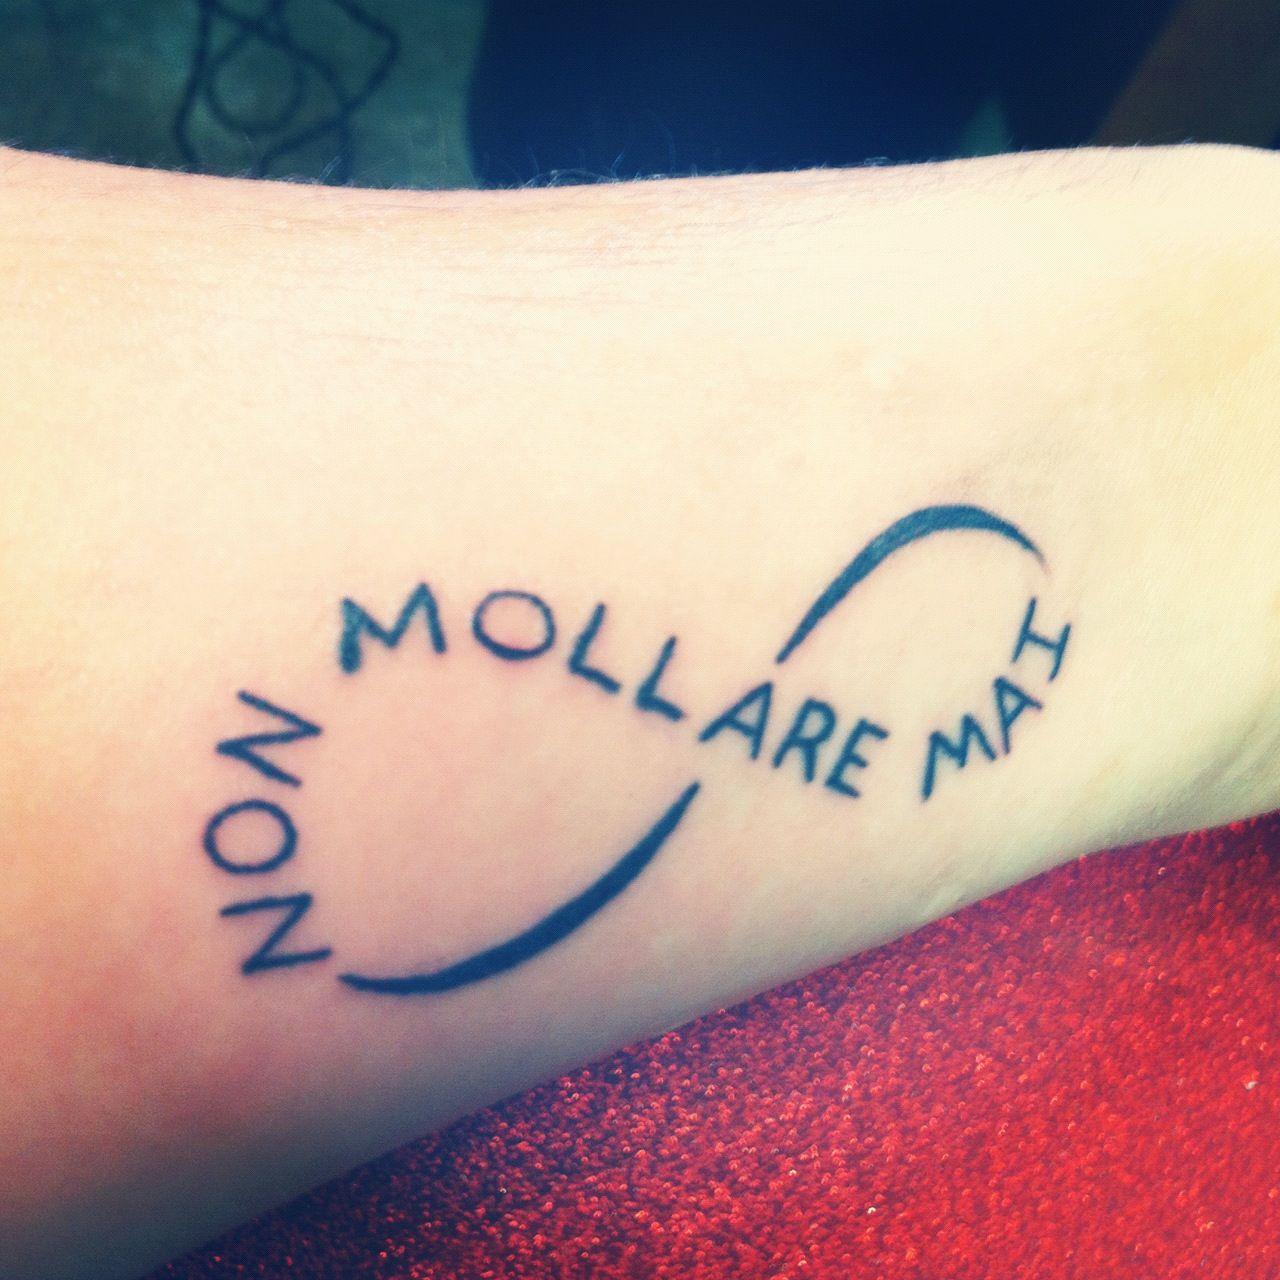 I had this tattooed on my left forearm above my wrist non mollare i had this tattooed on my left forearm above my wrist non mollare mai mean hippy tattooinfinity symboltattoo buycottarizona Images